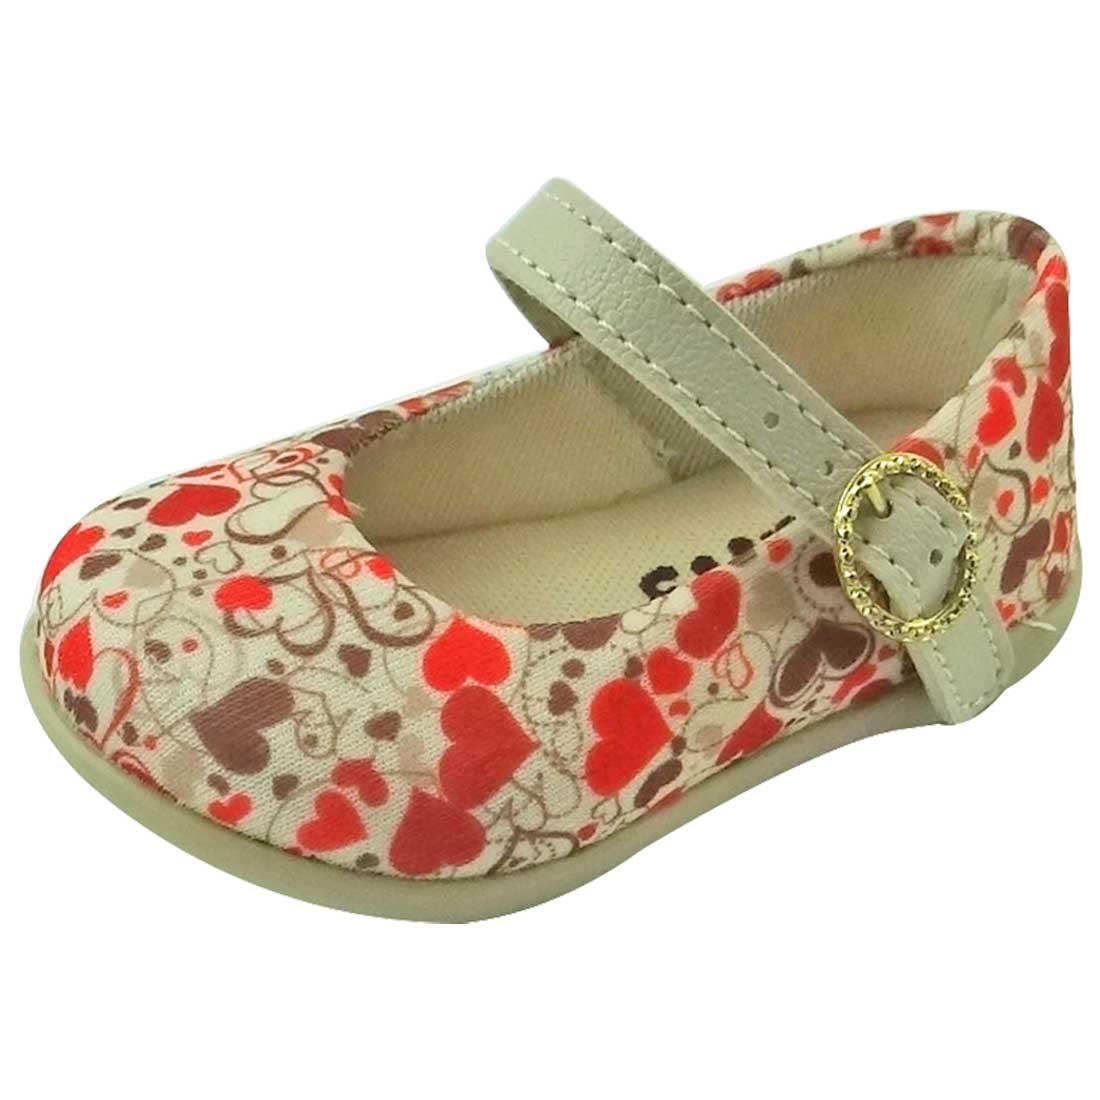 Sapato Boneca Baby com Coração - Bege e Laranja